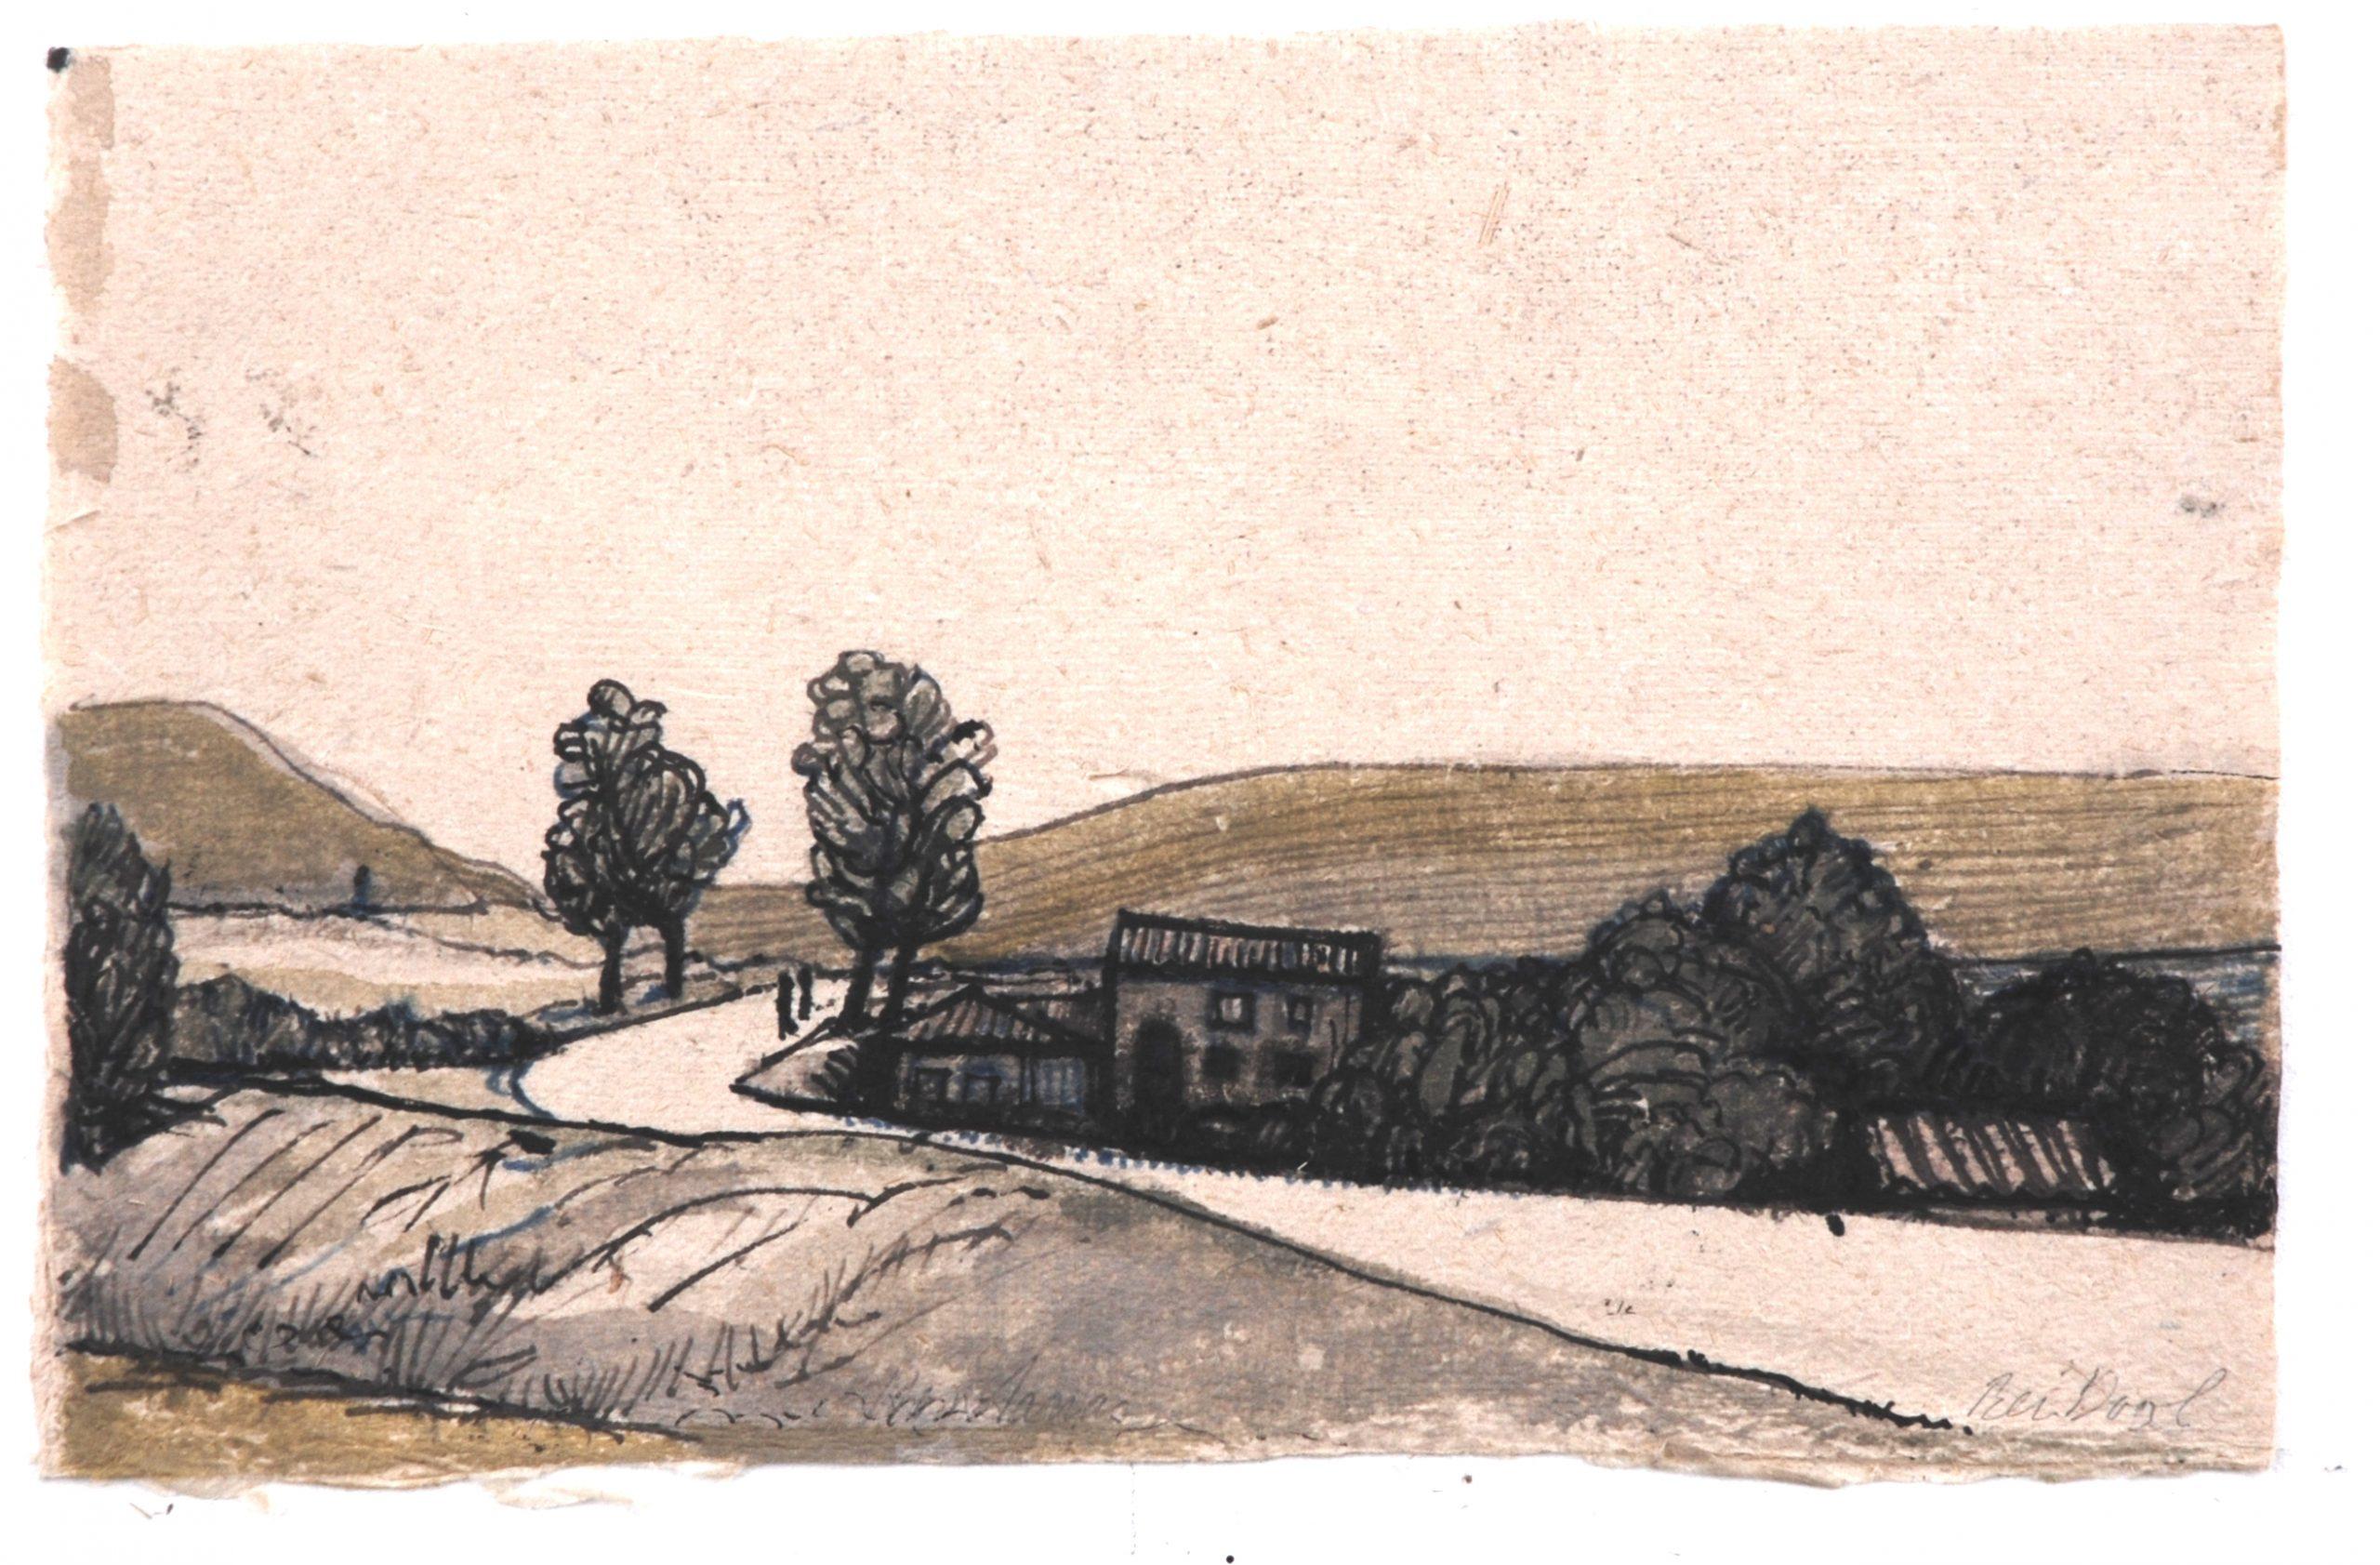 Castilla y Leon - Rein Dool, 19,5x13,5 cm. inkt 2005